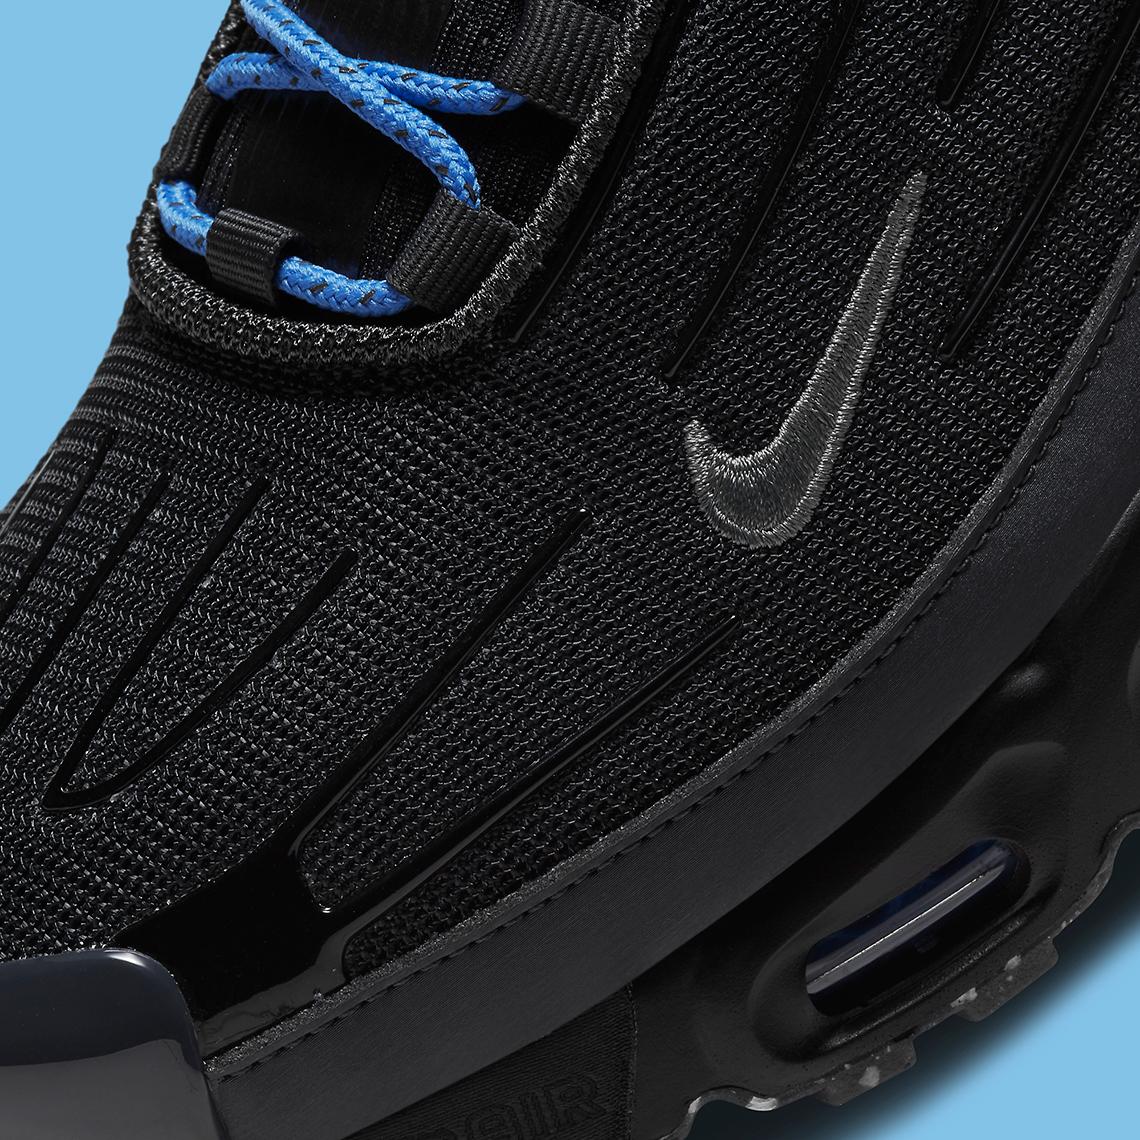 Nike Air Max Plus 3 DH3984-001 Release Info | SneakerNews.com